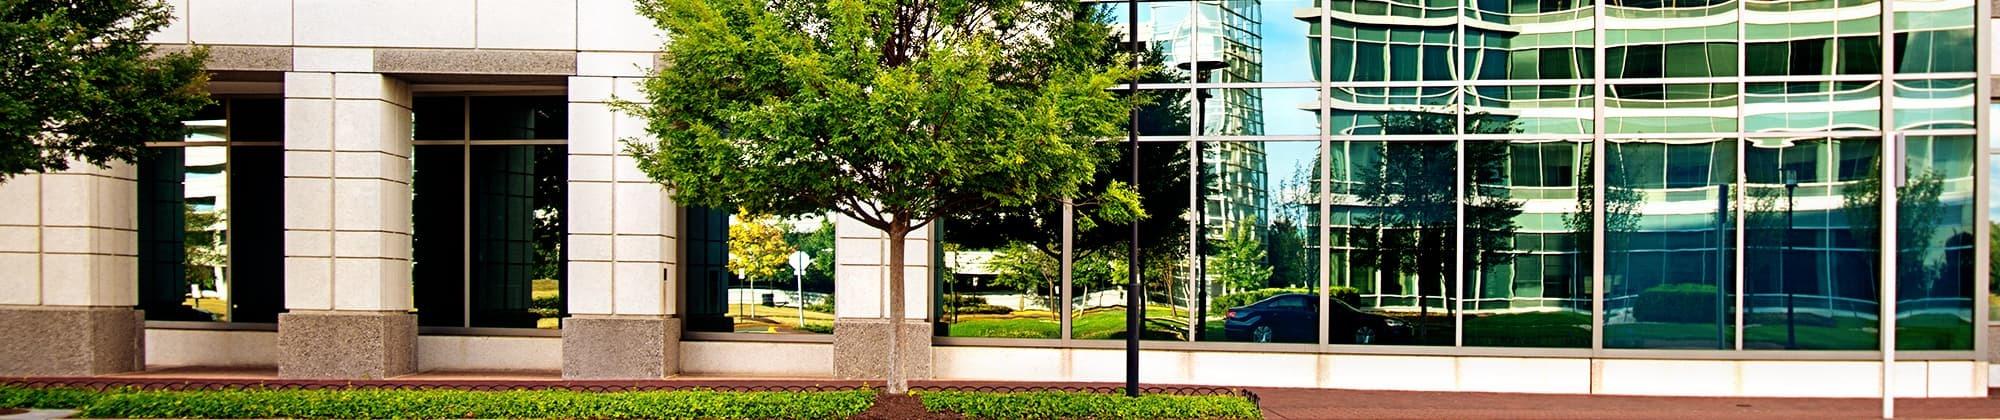 Personal Financial Management Advisors Century City